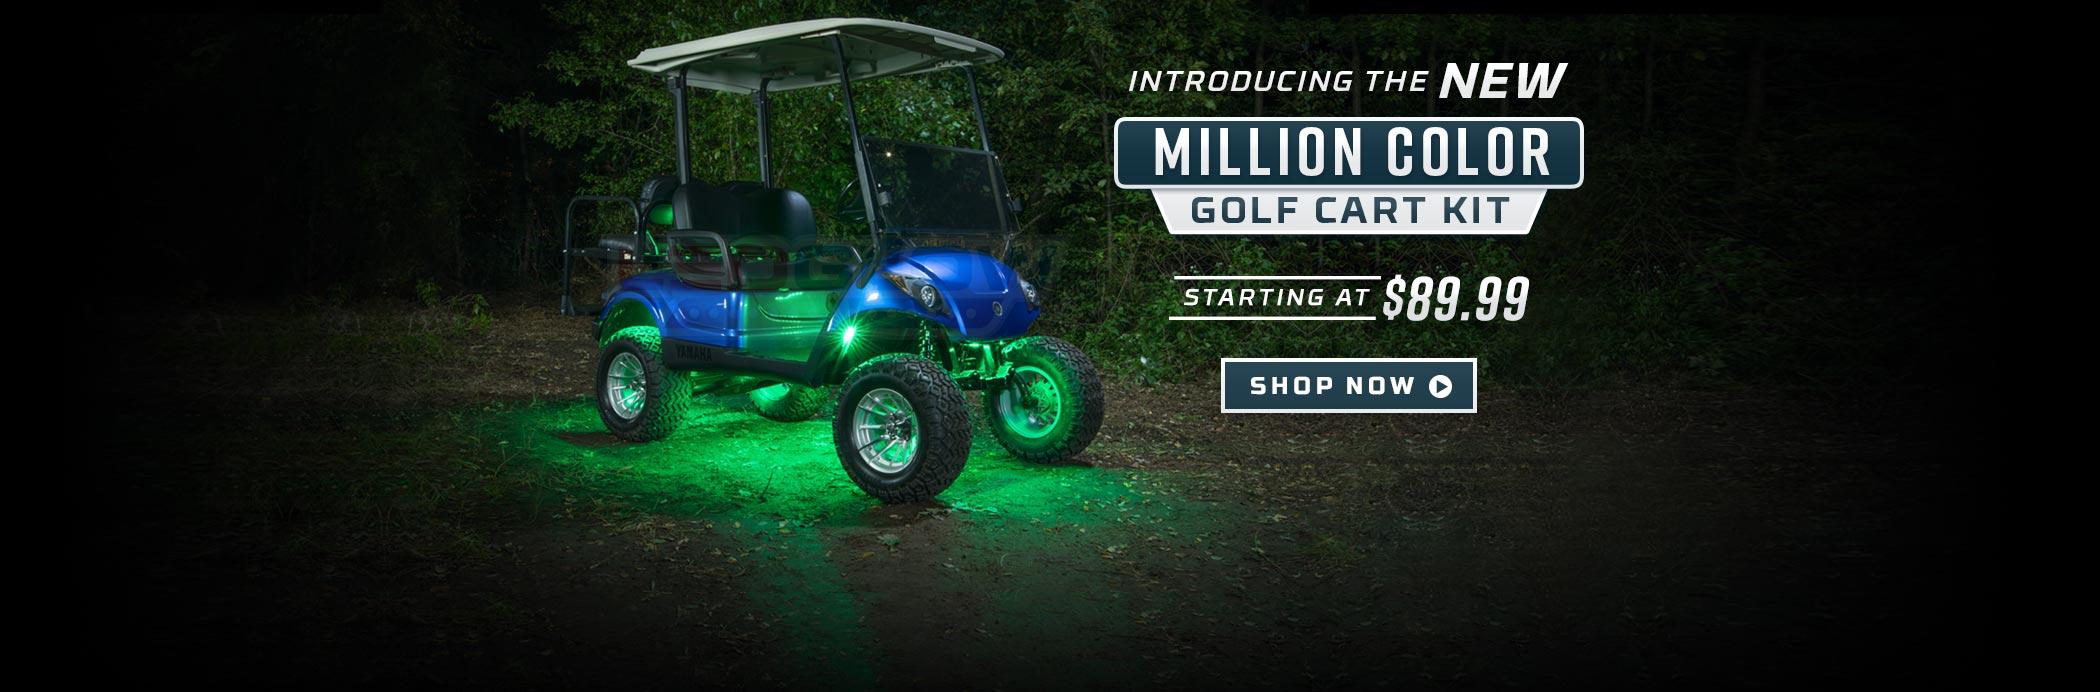 Million Color Golf Cart Underbody Light Kit Slider